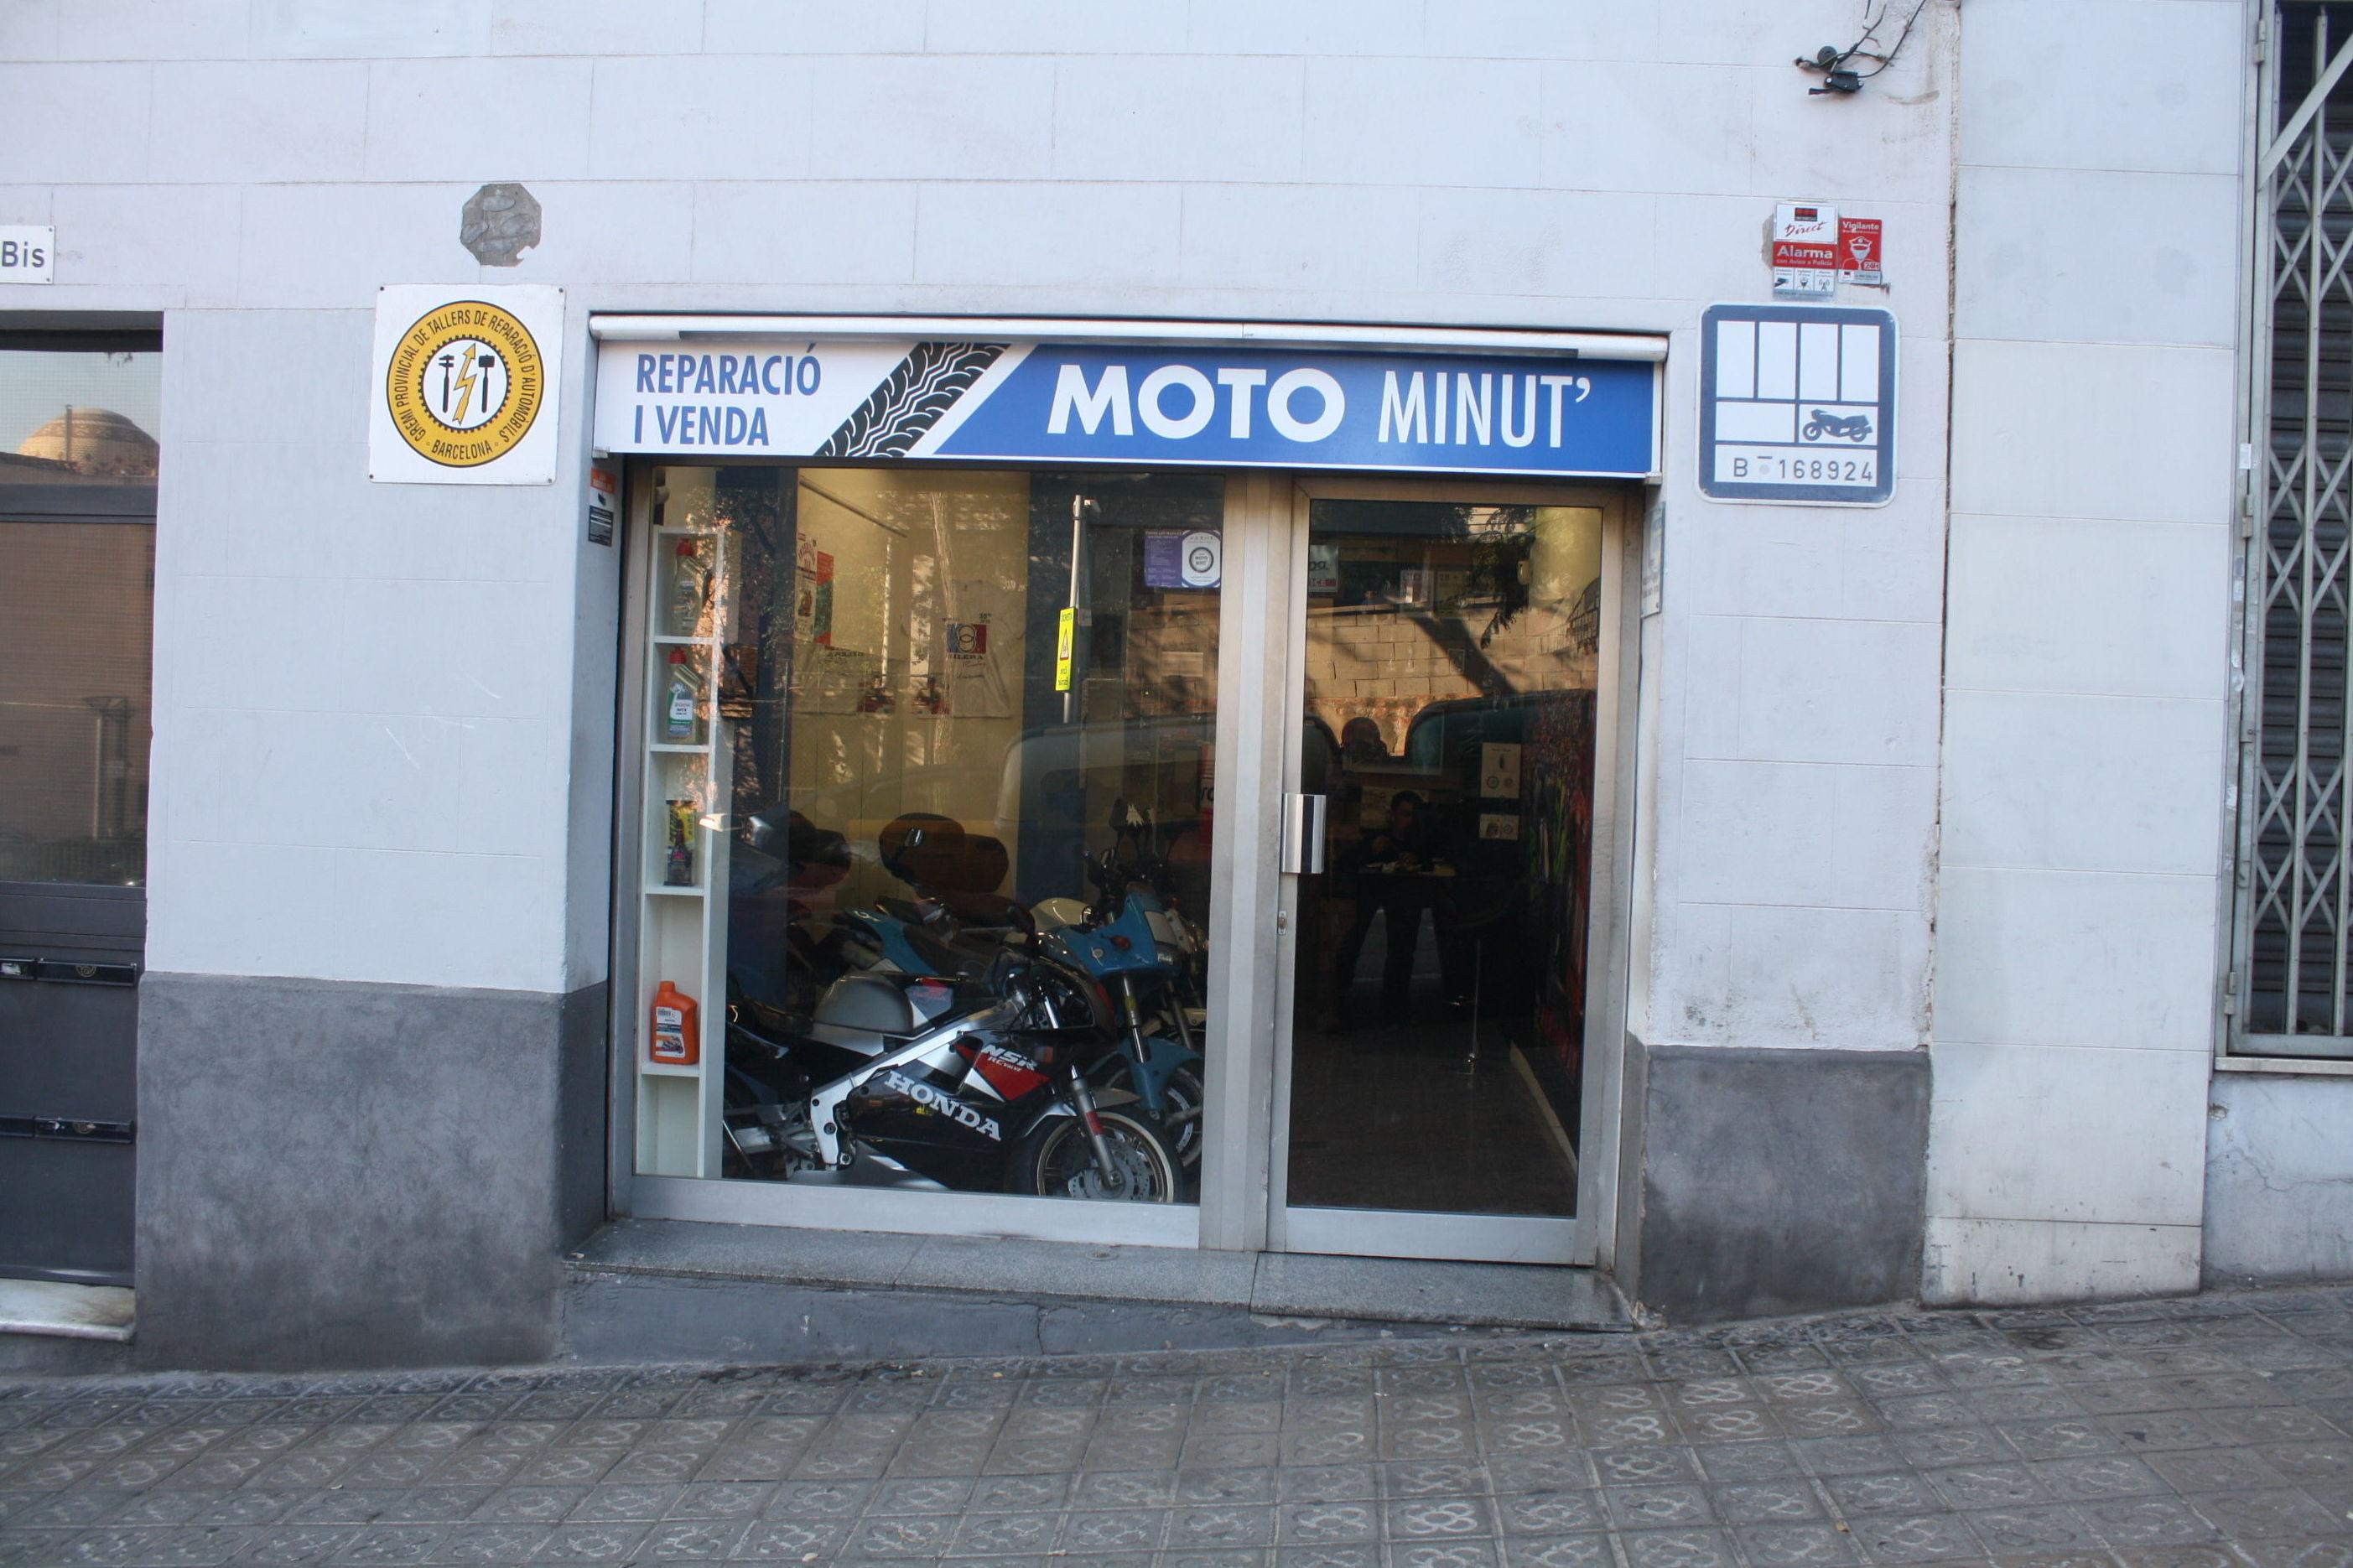 Foto 12 de Motos en  | Motominut